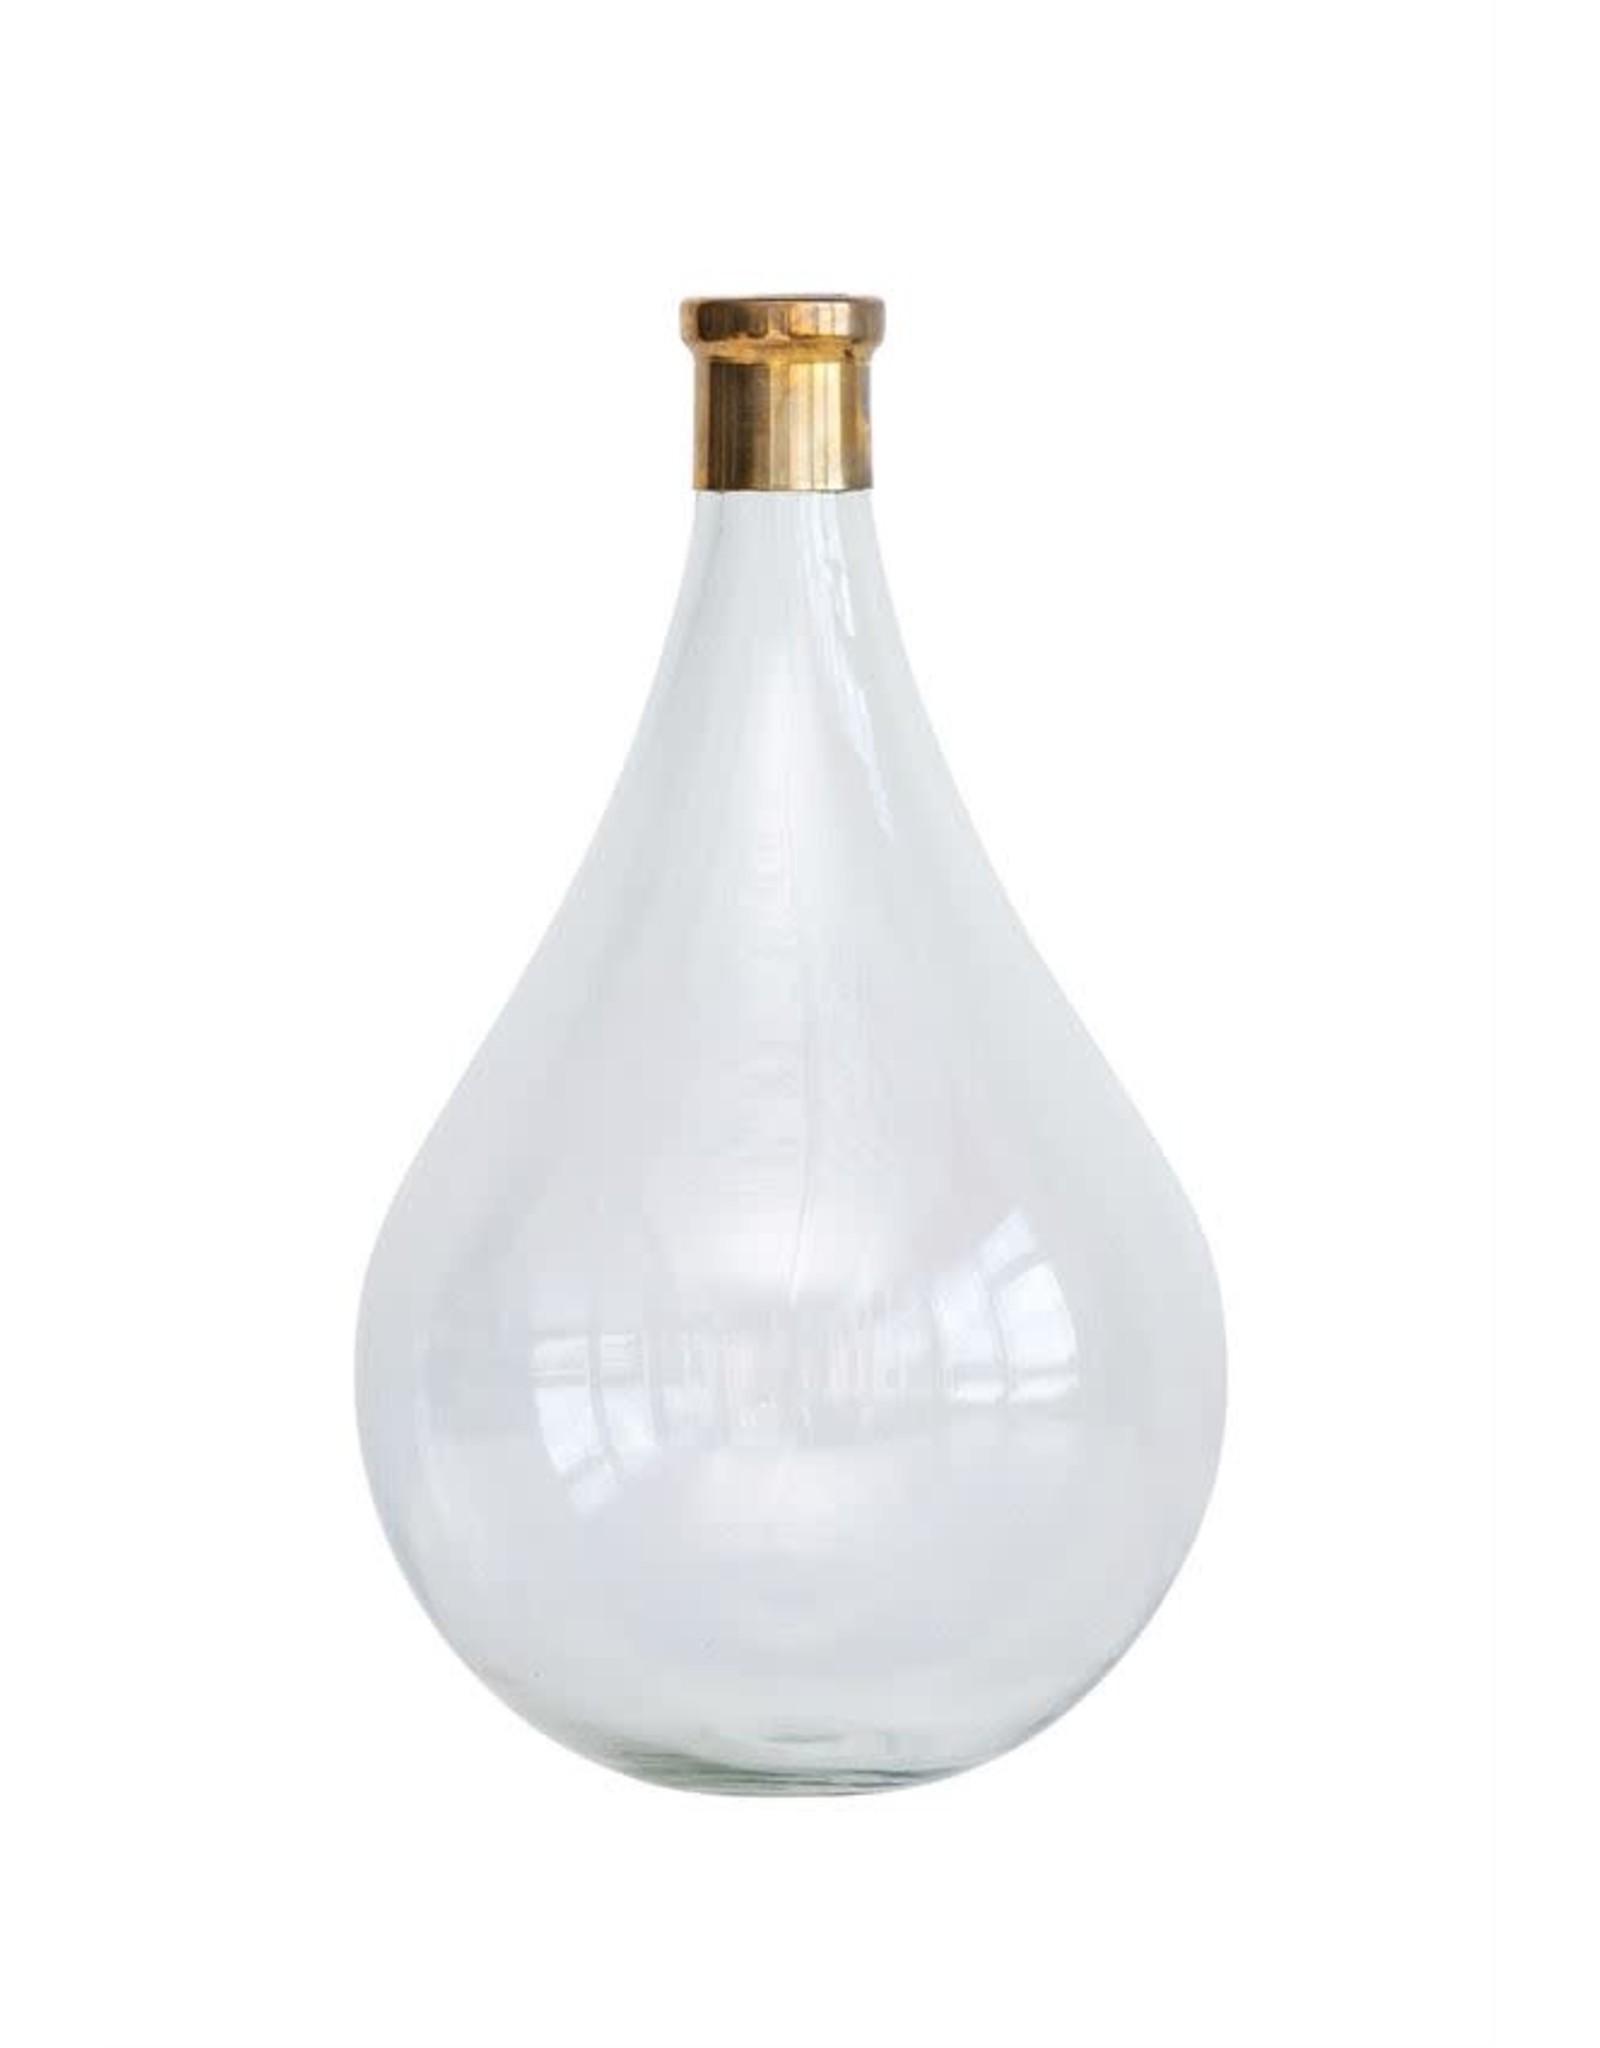 "Bloomingville 8-1/2"" Round x 15-1/2"" Glass & Brass Vase"